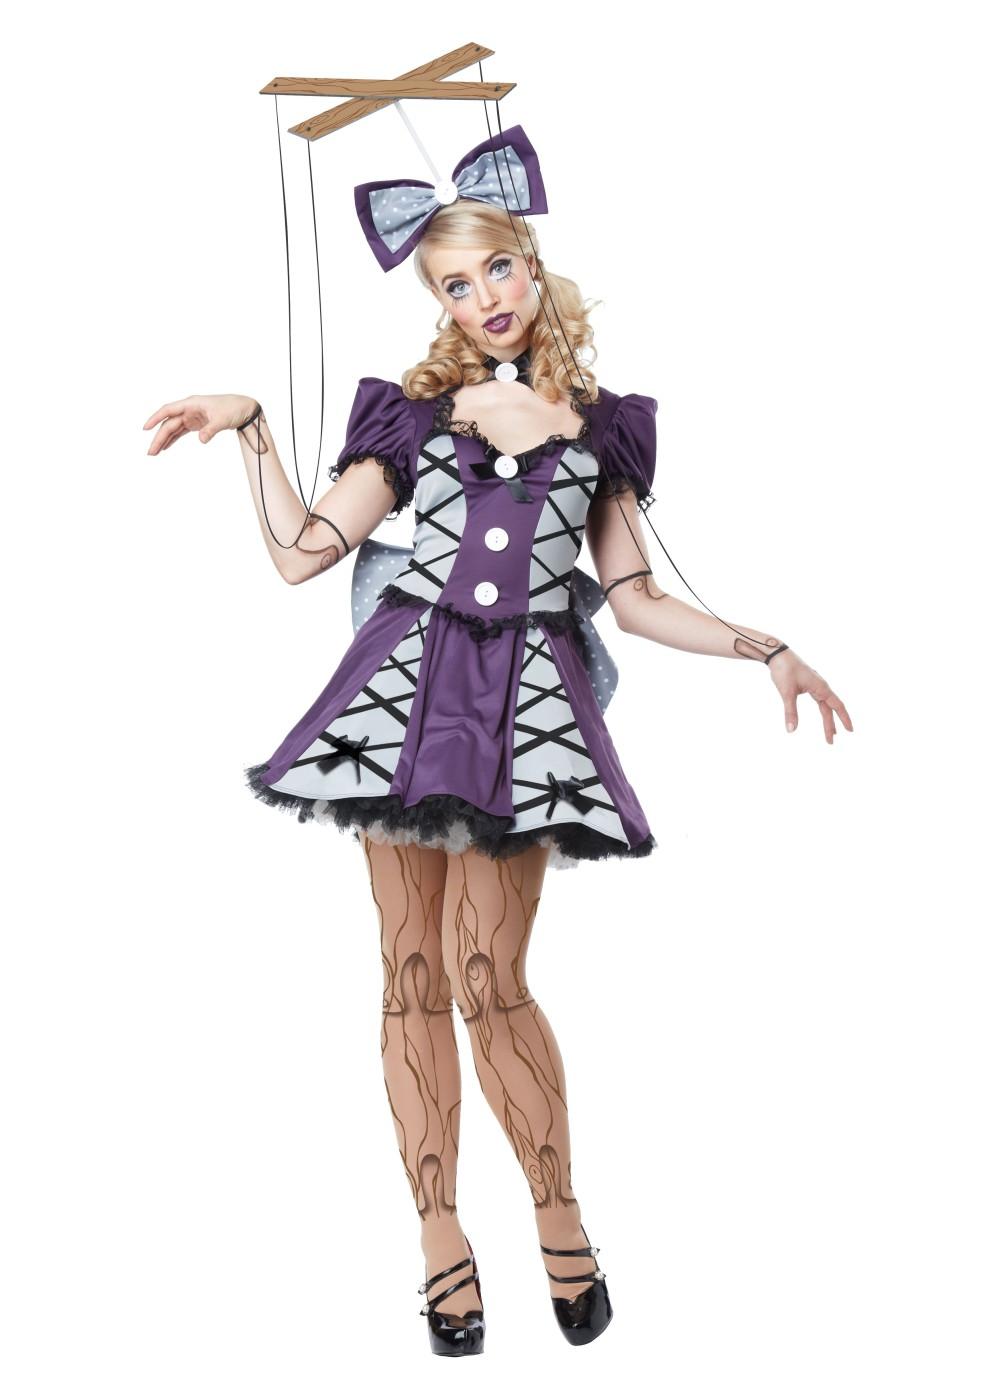 marionette women costume funny costumes. Black Bedroom Furniture Sets. Home Design Ideas